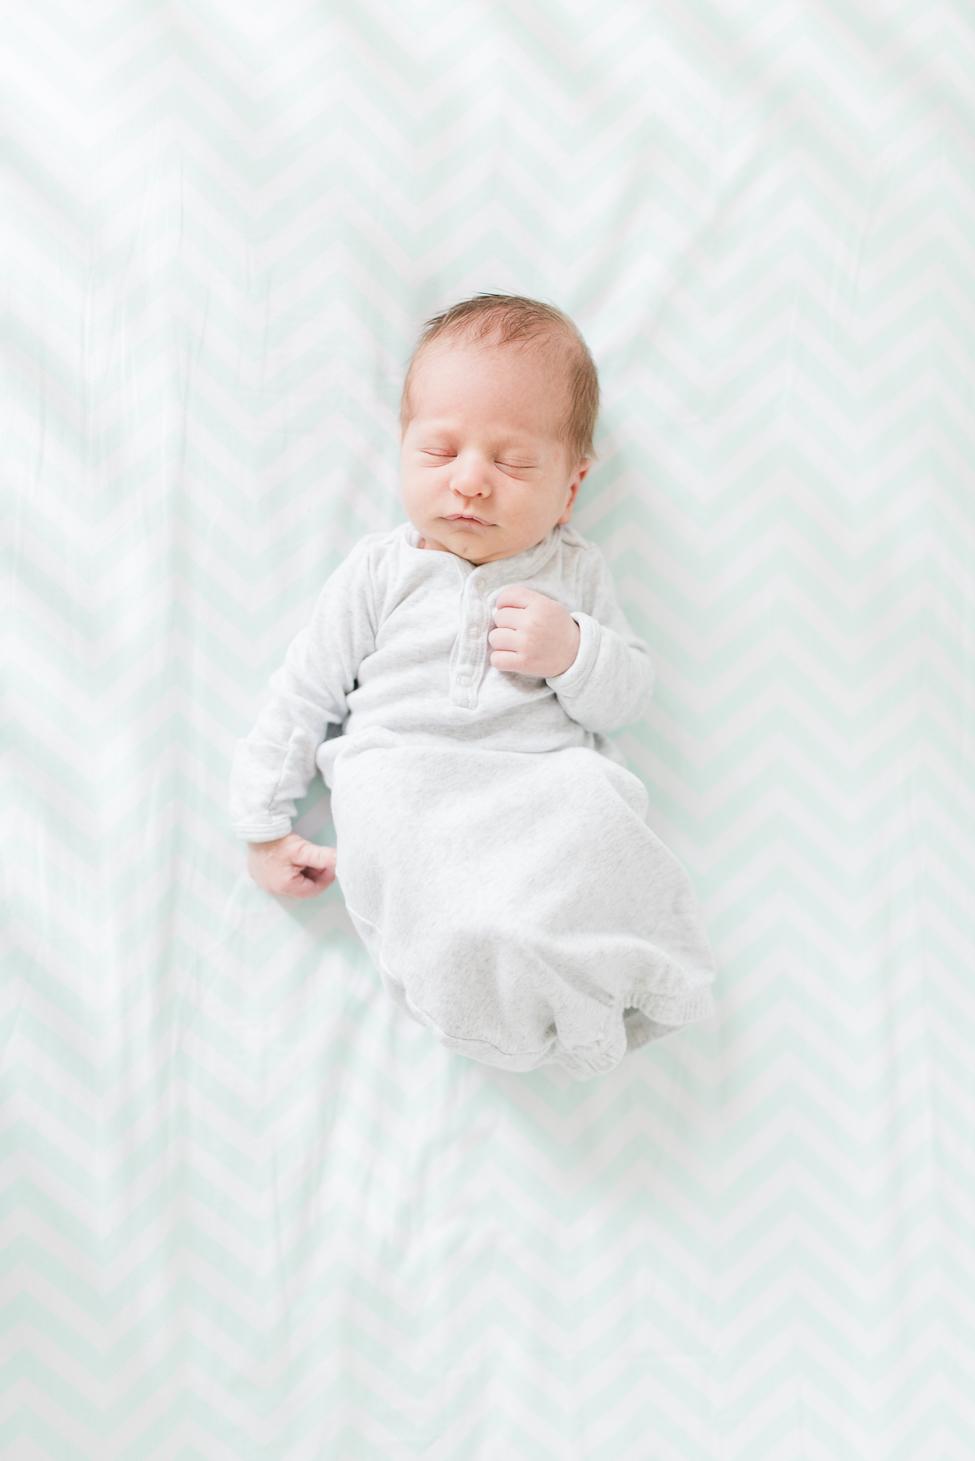 Baltimore-Maryland-lifestyle-newborn-photographer-photos-by-breanna-kuhlmann-#bklp-34.jpg